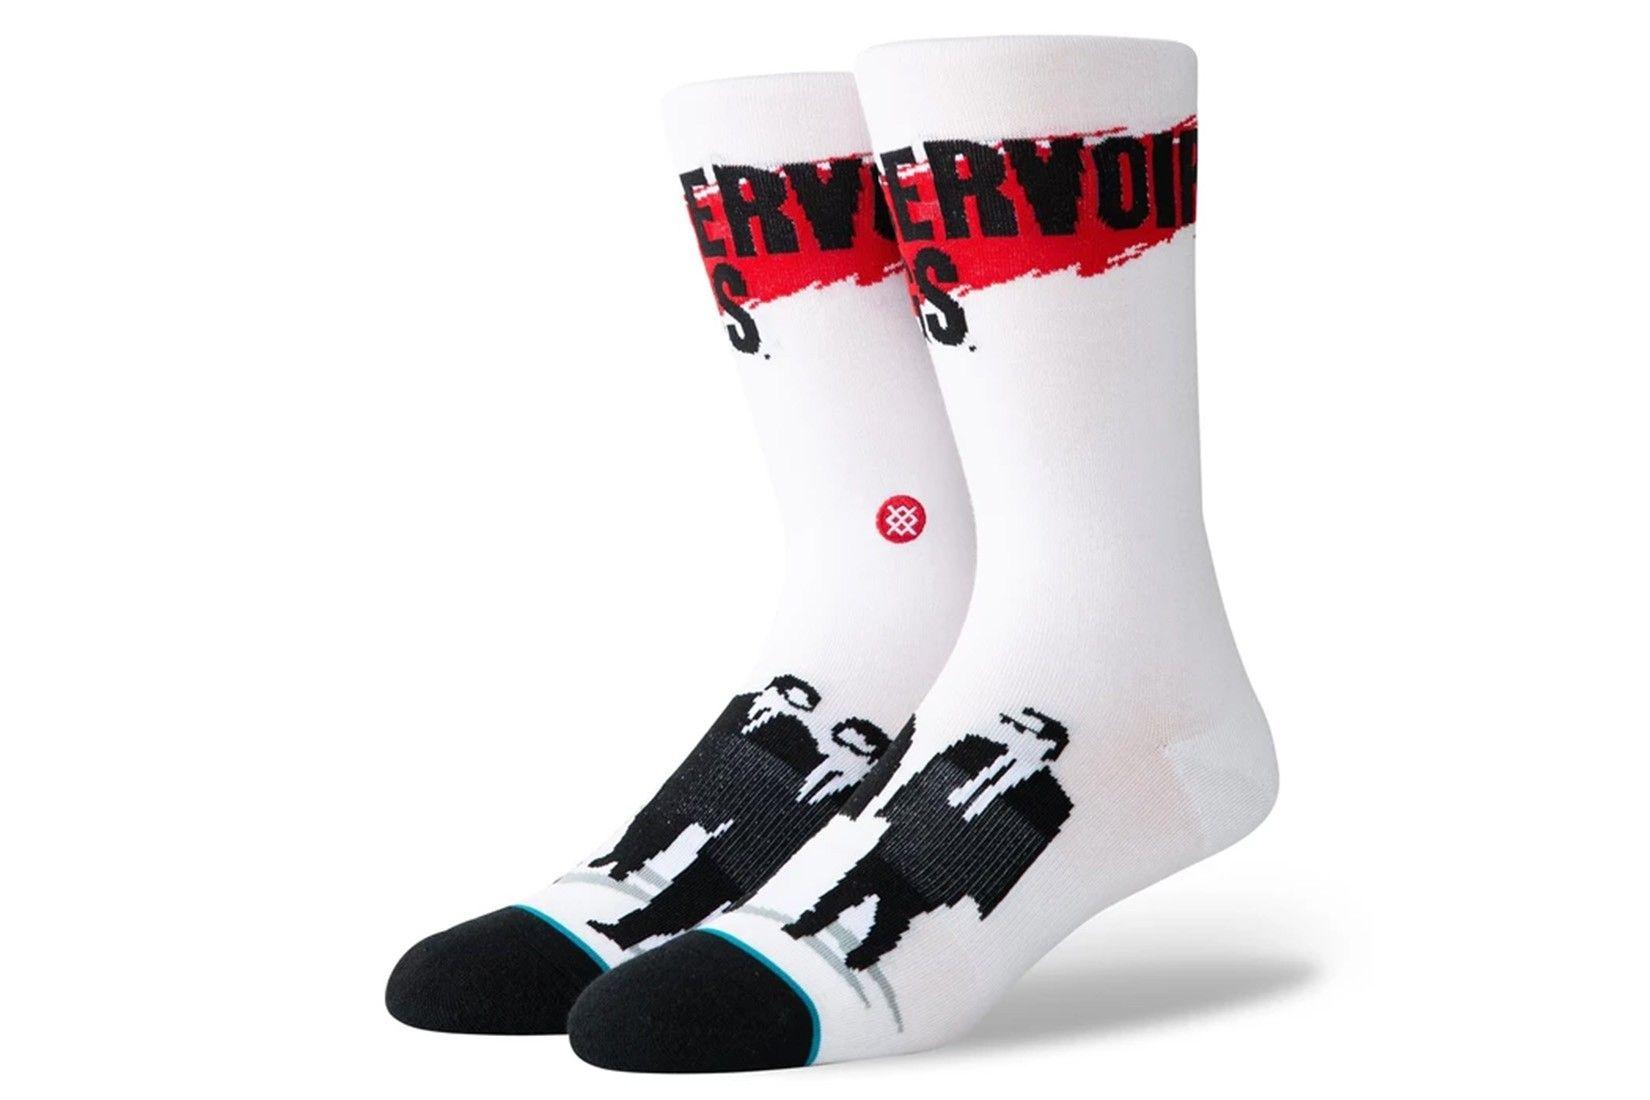 Afbeelding van Stance Reservoir Dogs M545C19Res Sokken White